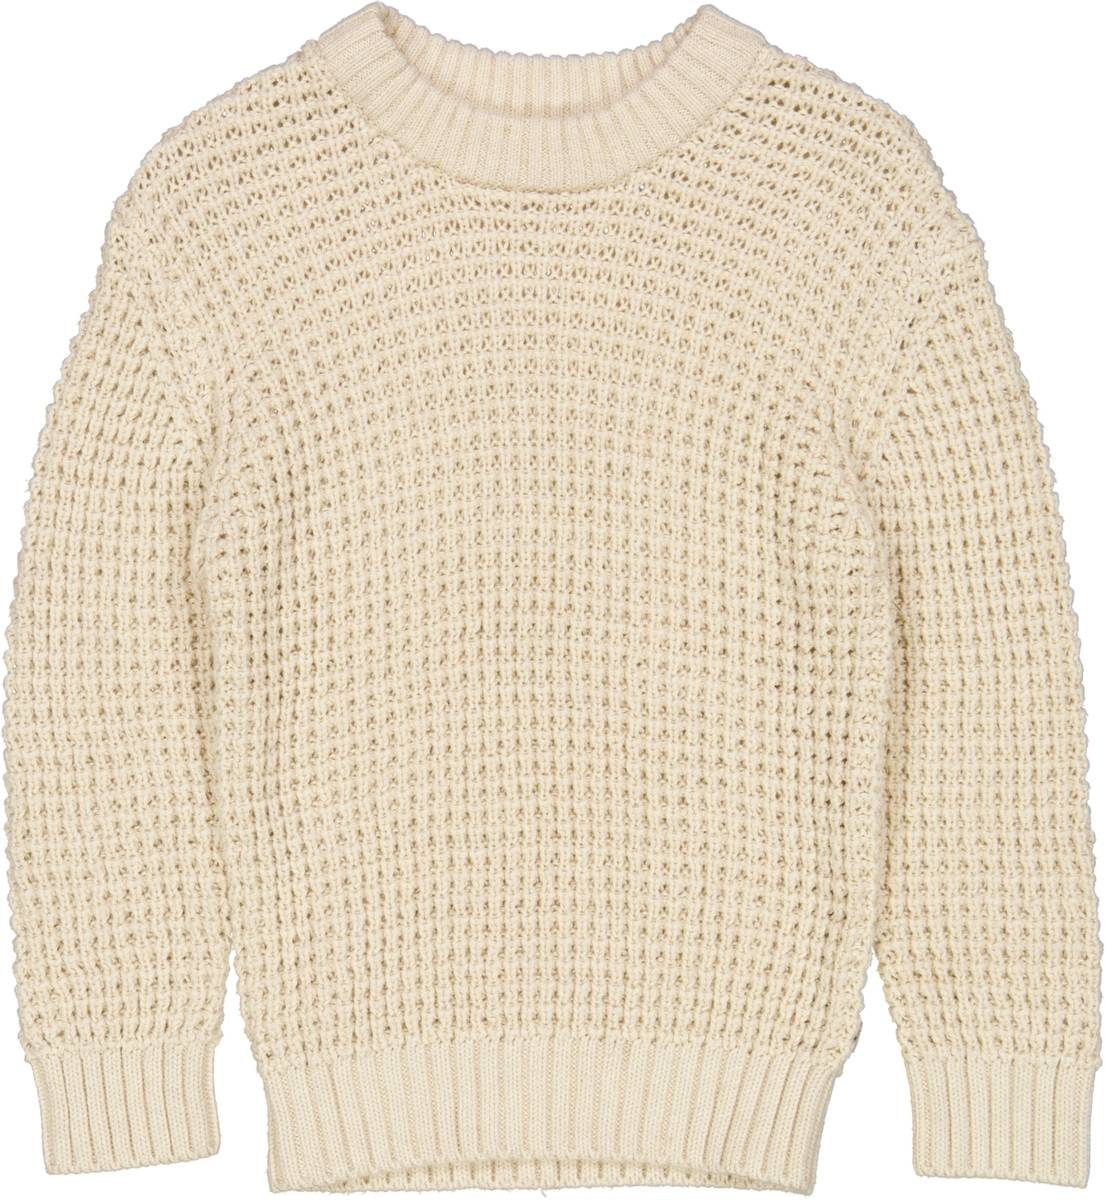 Wheat Knit pullover Charlie - cloud melange